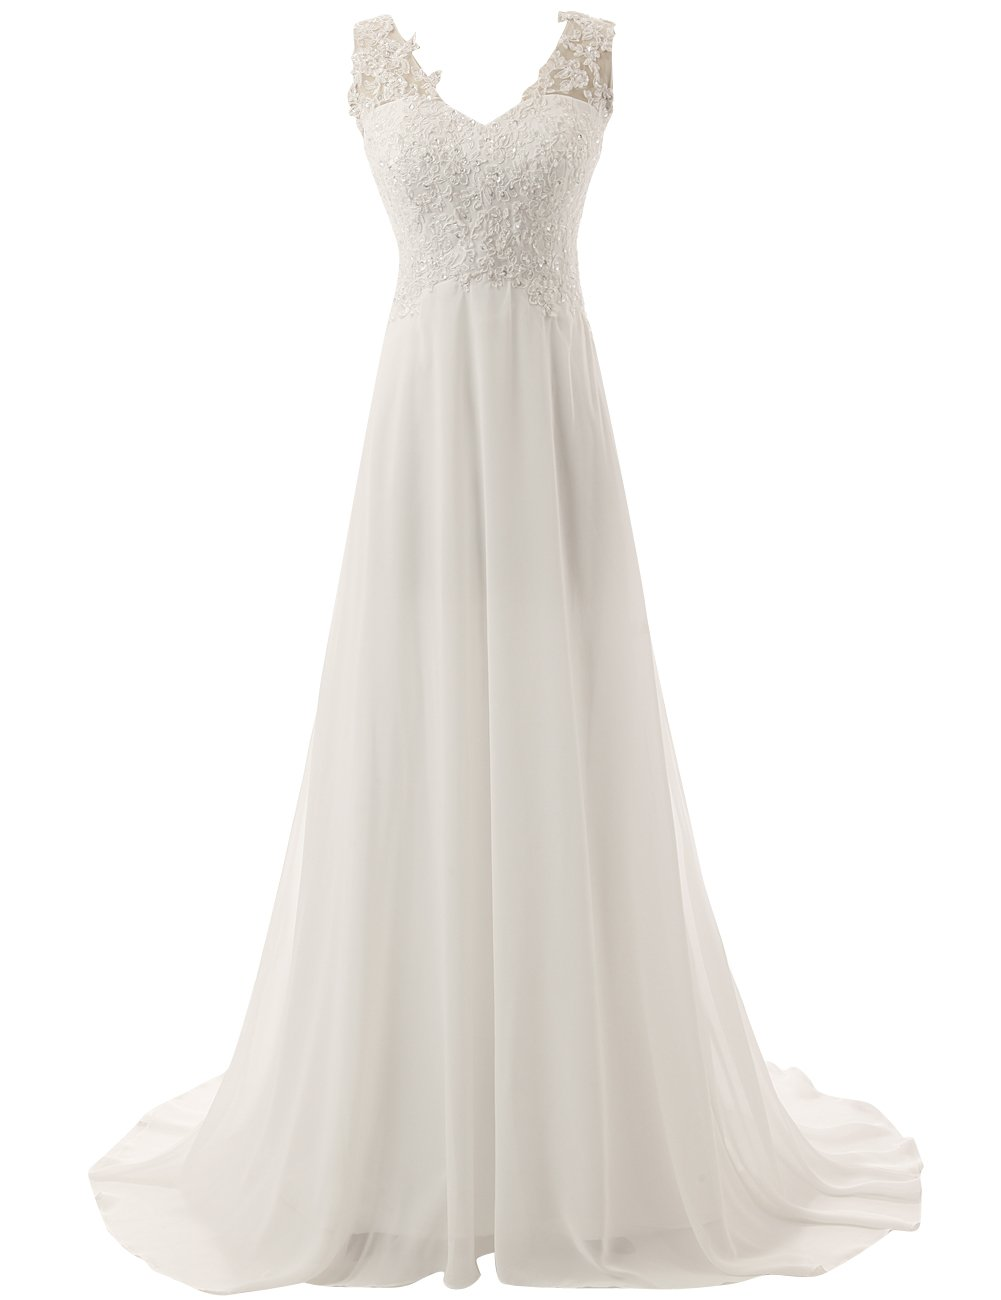 JAEDEN Elegant Lace Beach Wedding Dresses Chiffon V Neck A Line Long Bridal Gown Ivory US18W